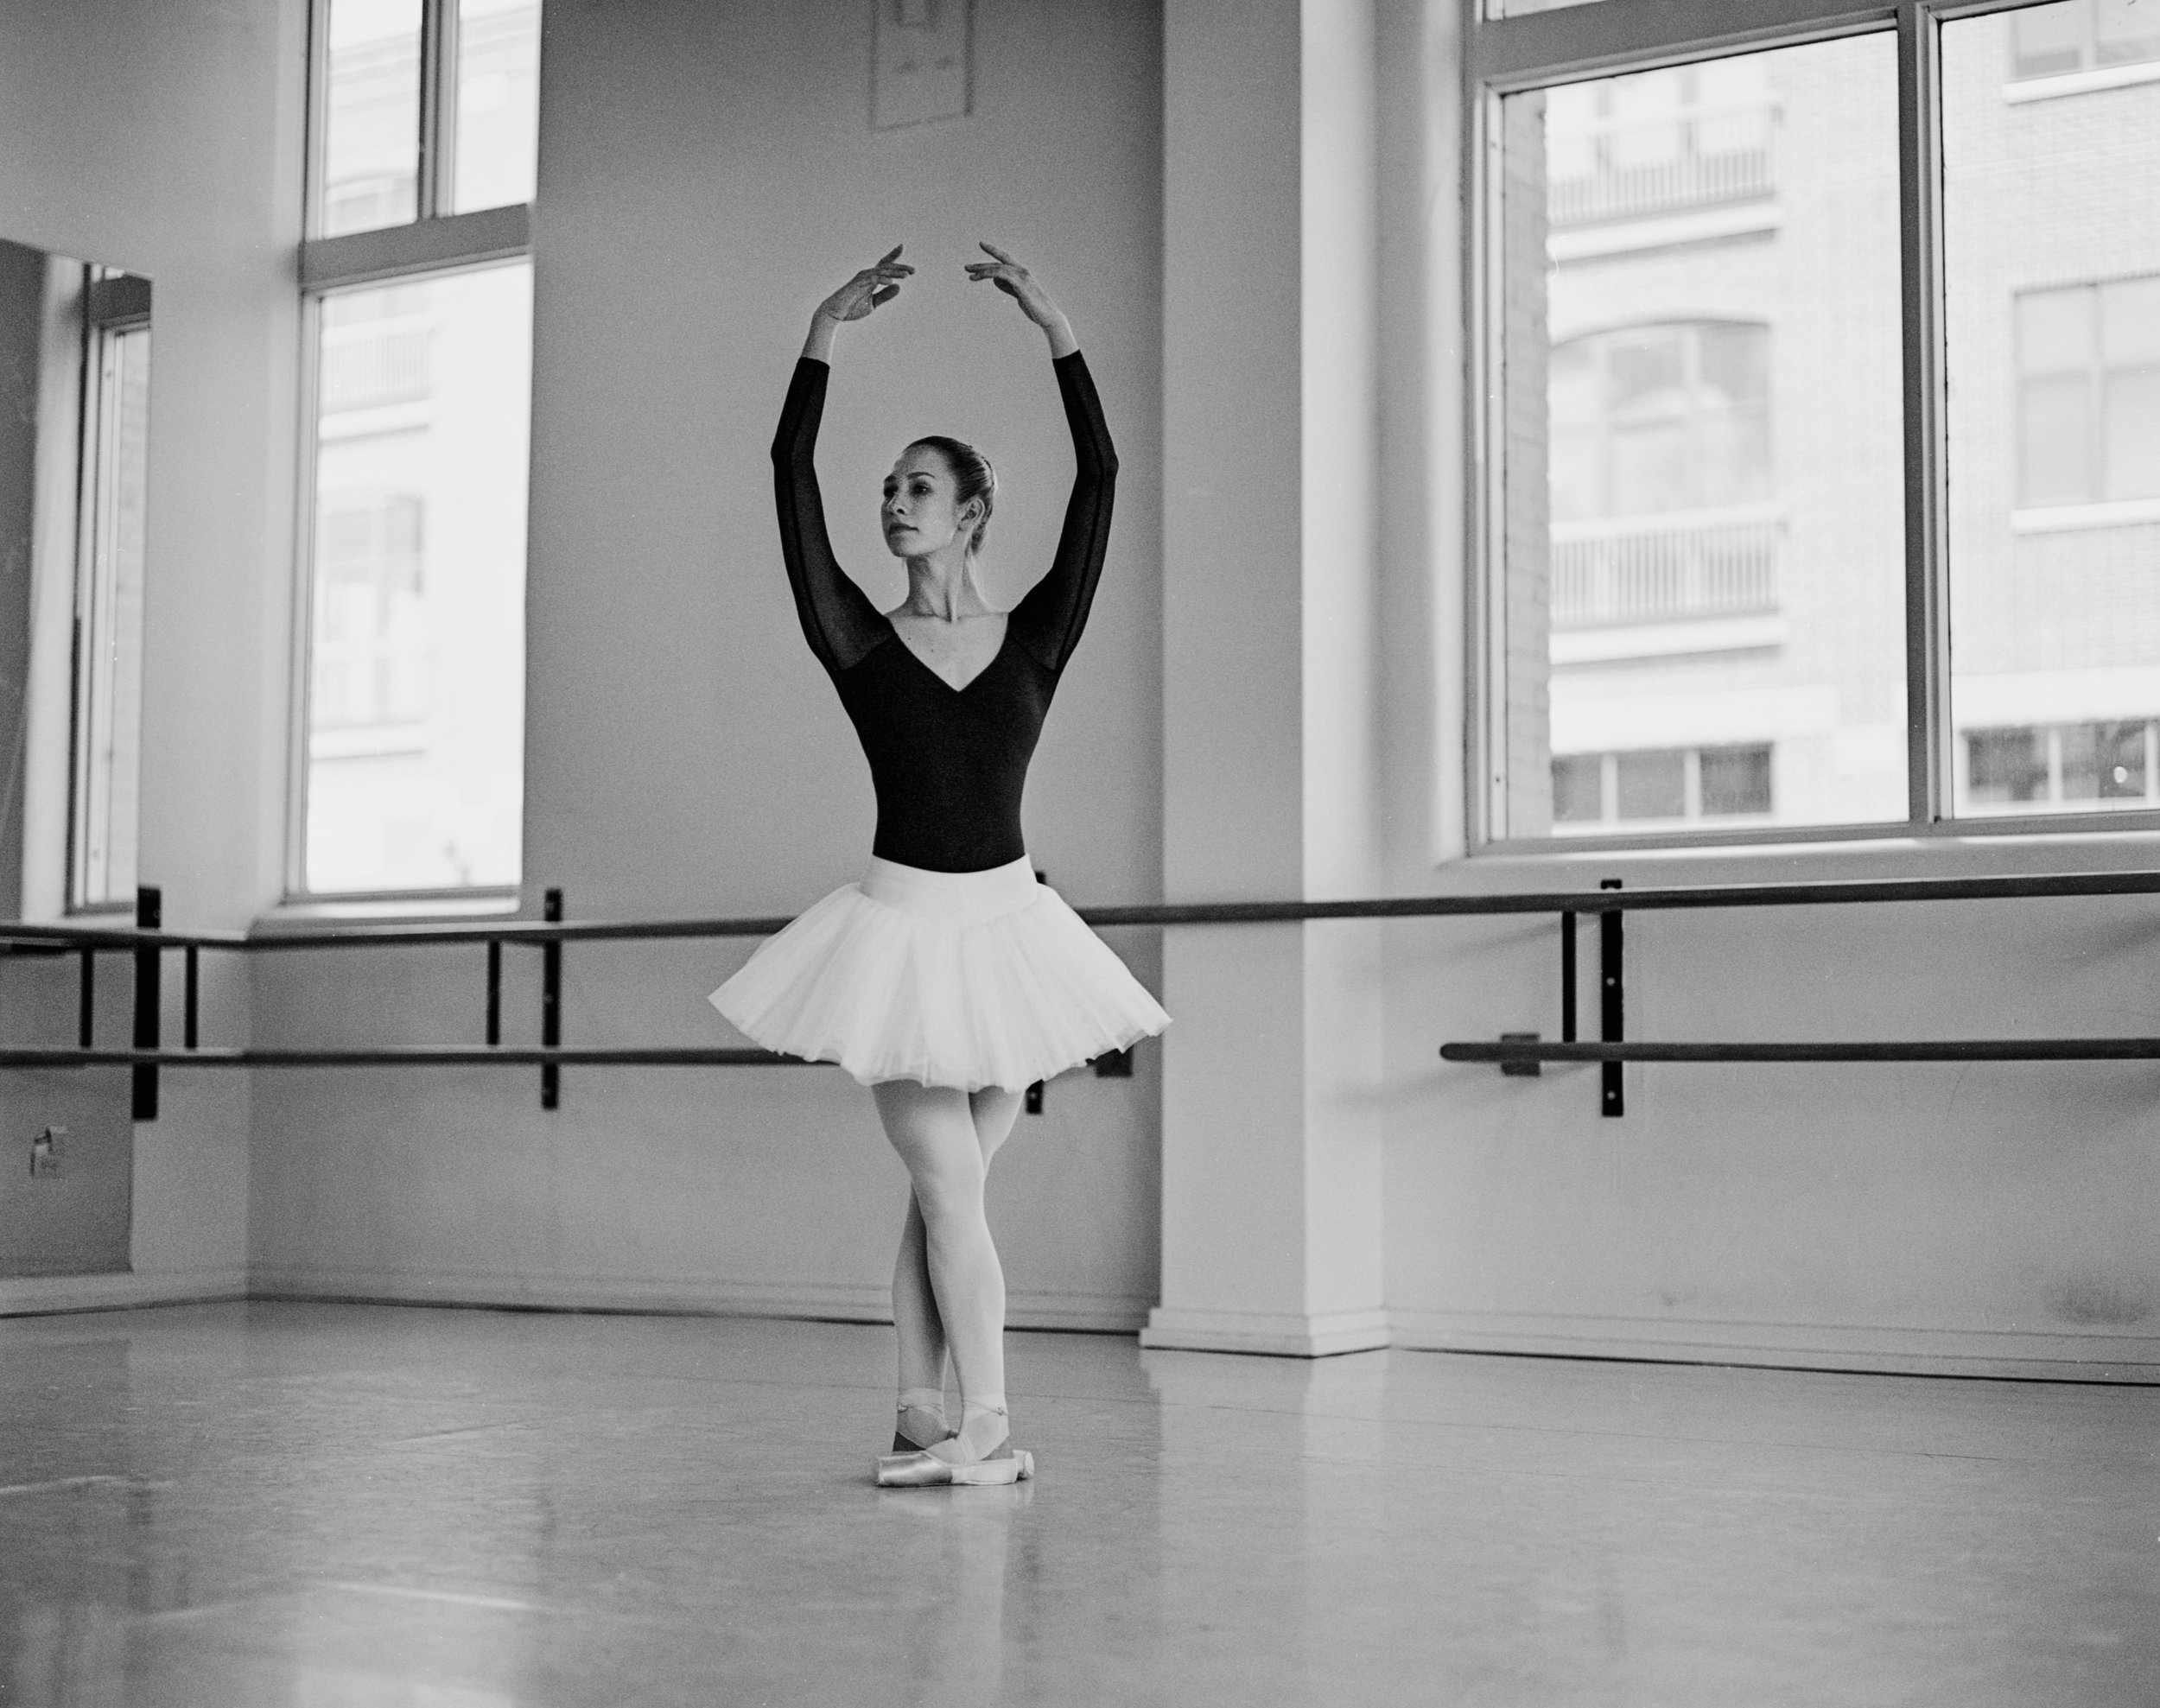 Jessica_Ballet-28.JPG